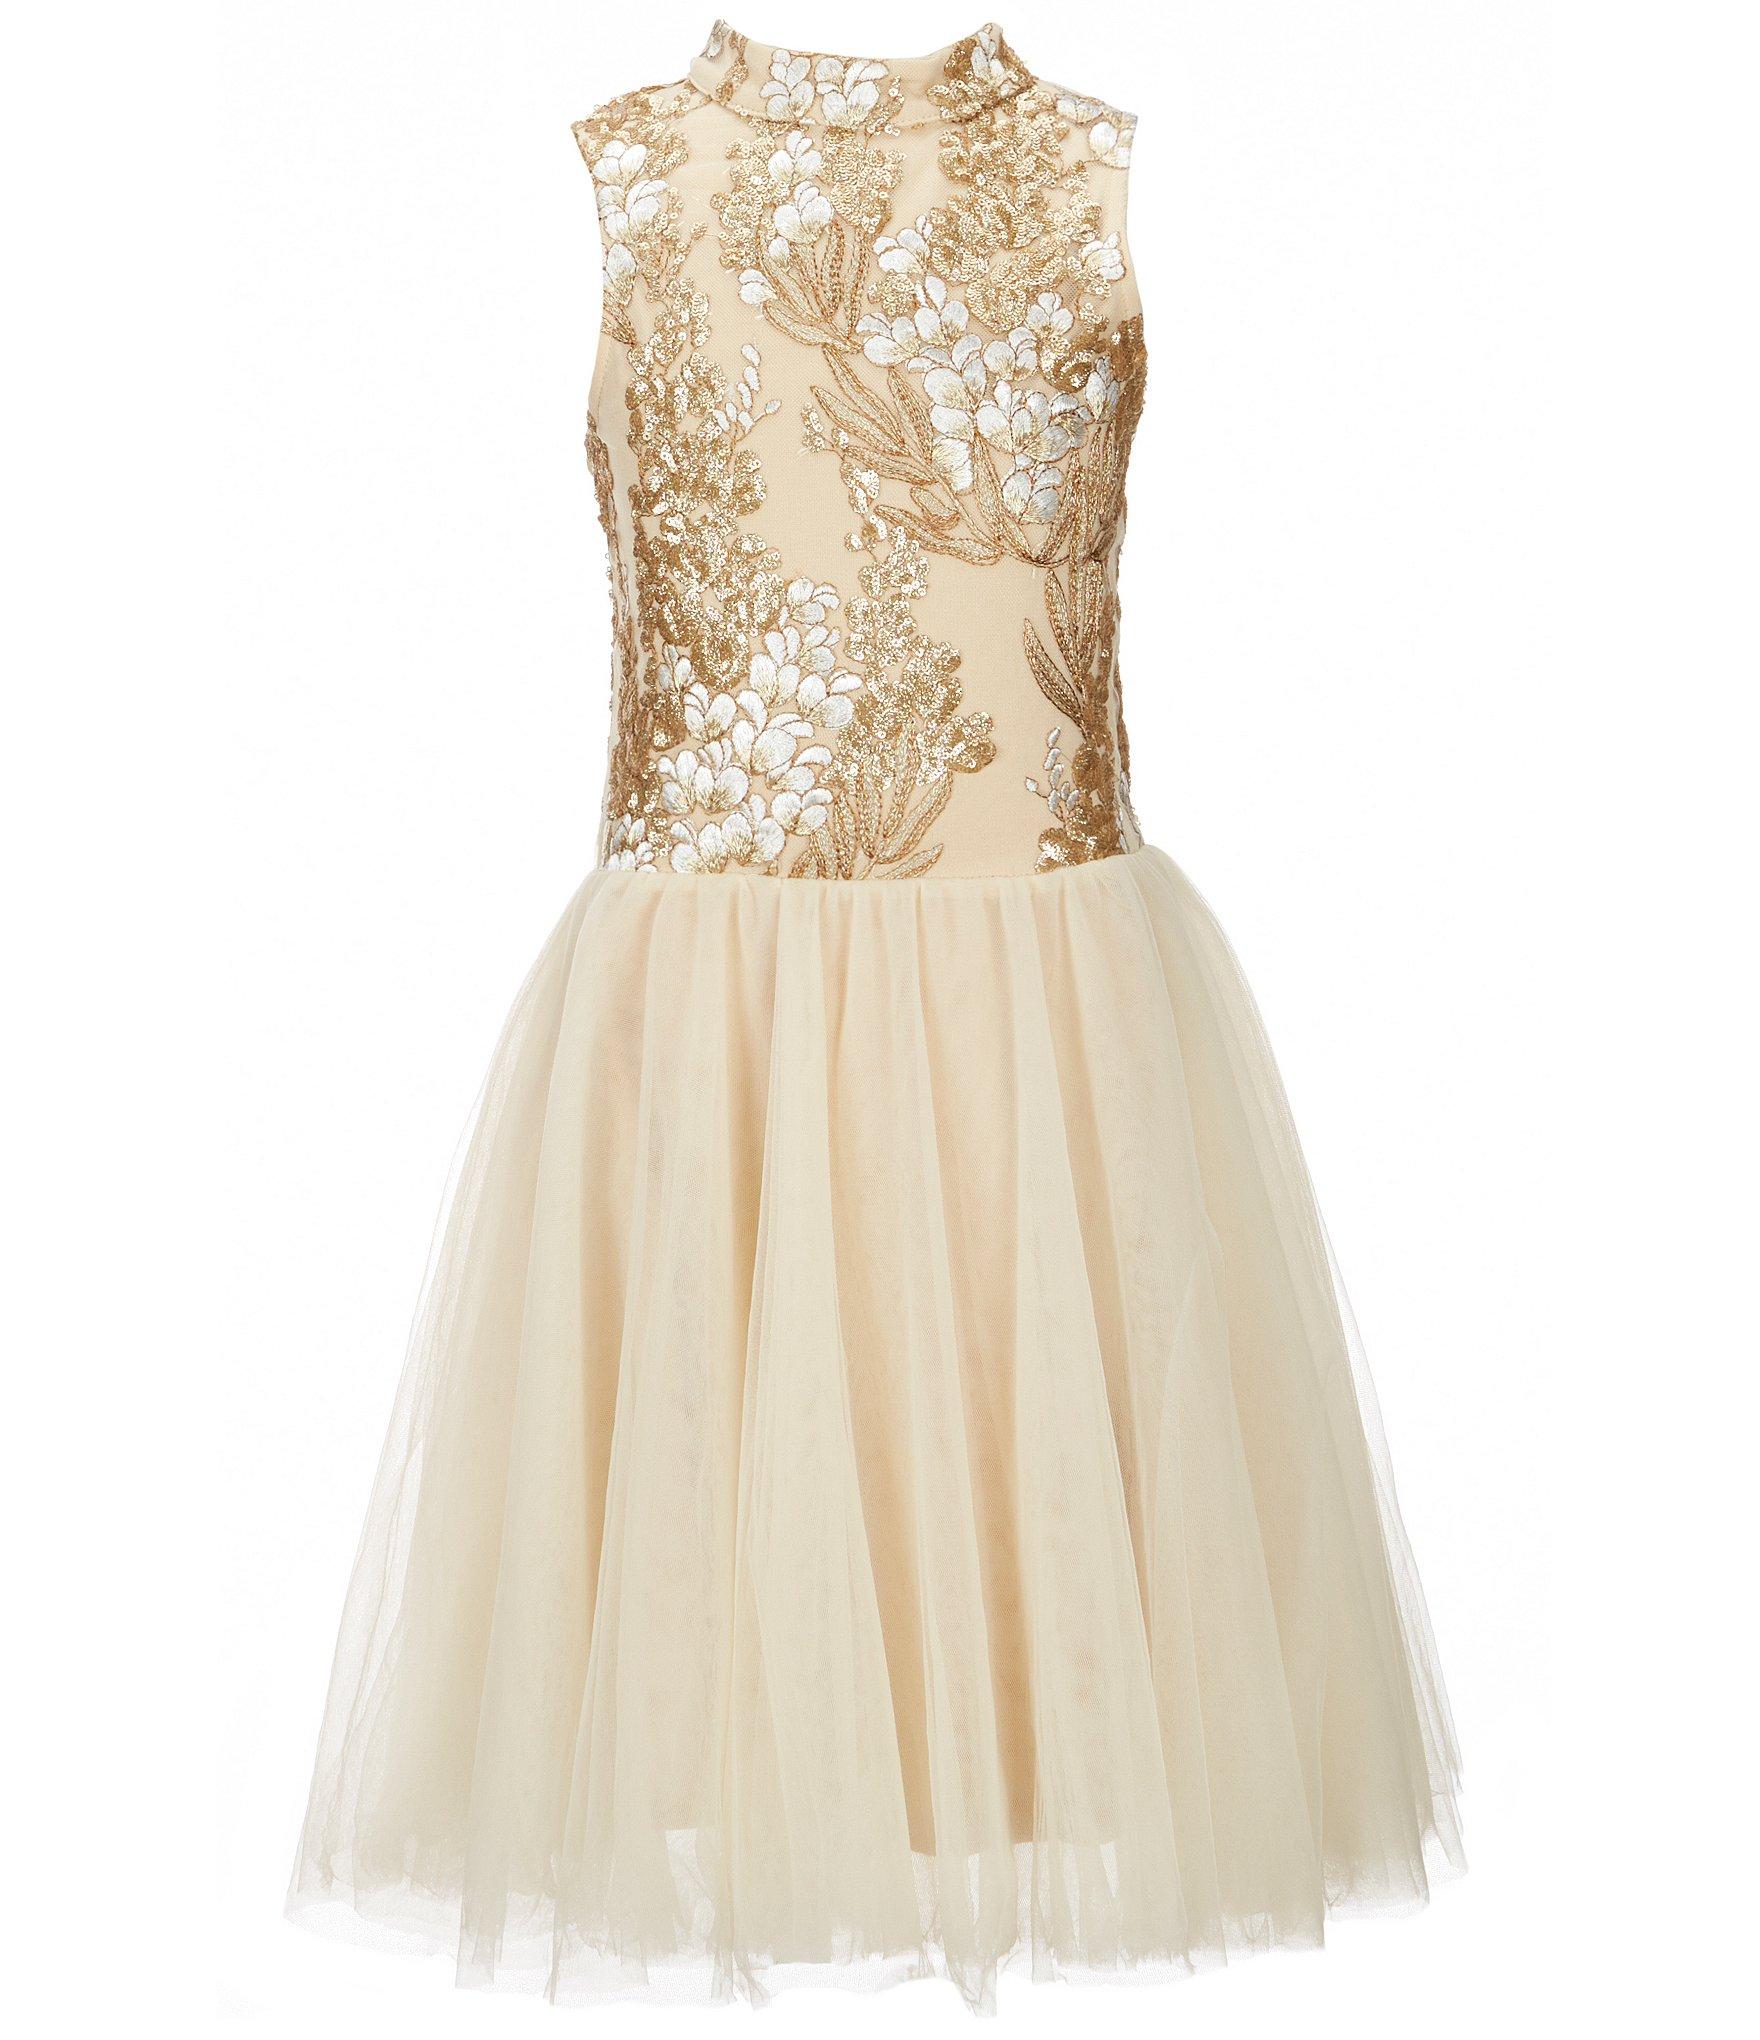 Long sleeve lace dress dillards furniture